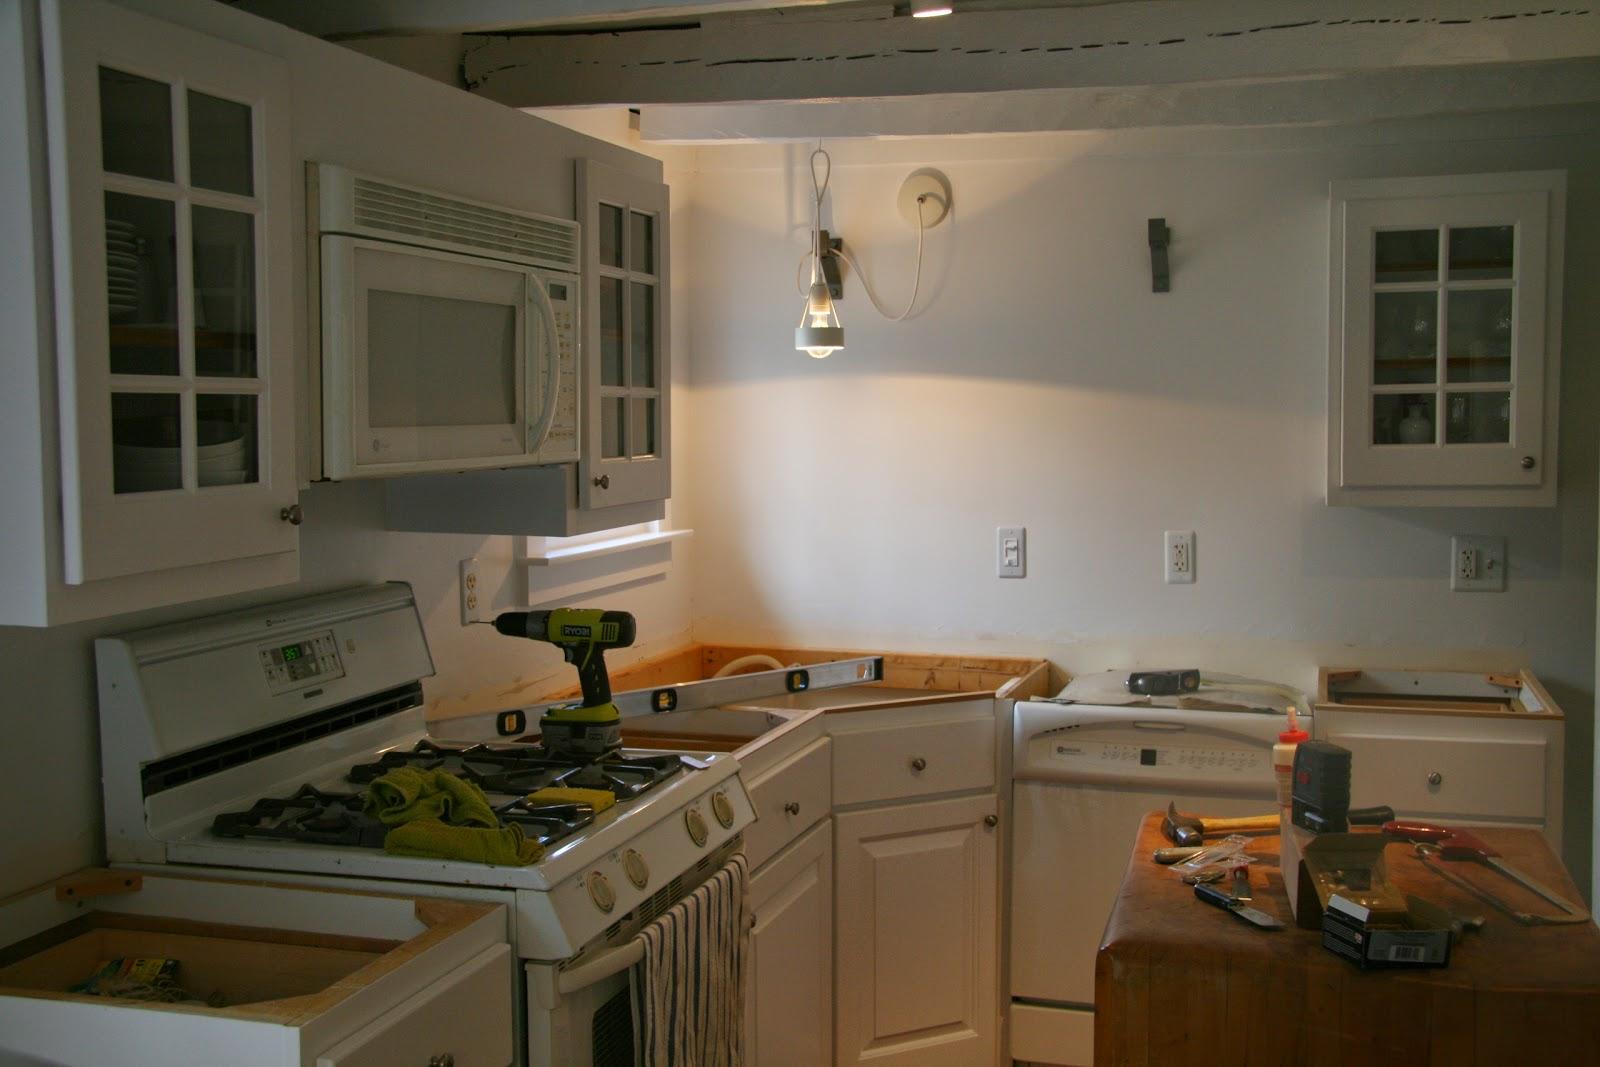 leveling kitchen cabinets